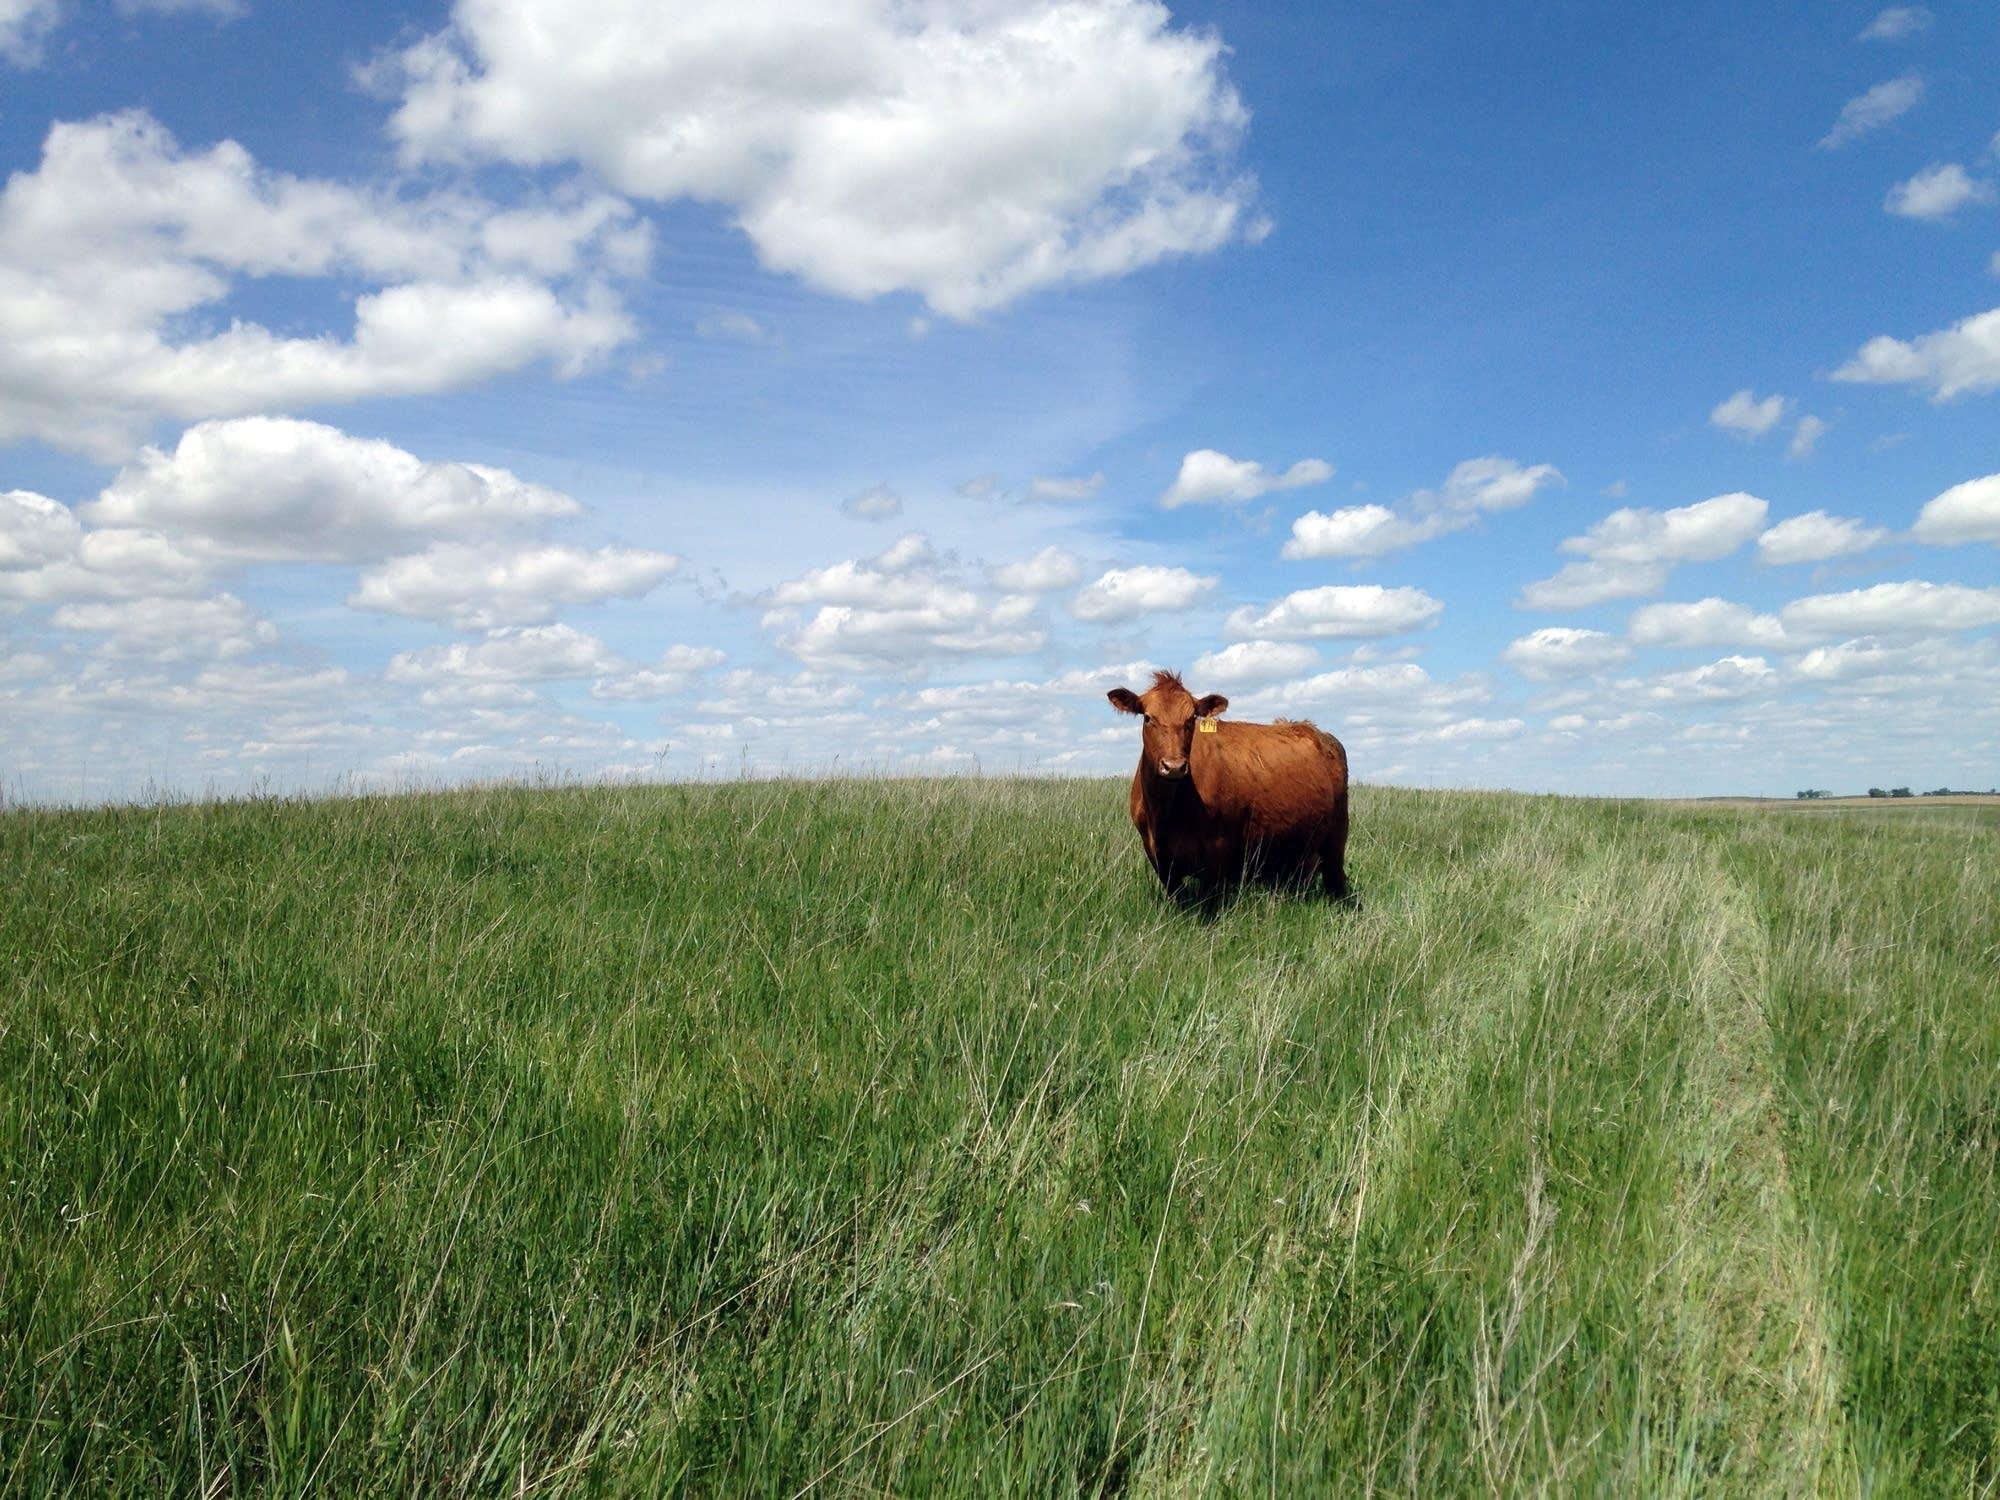 A cow grazes near Wing, North Dakota.